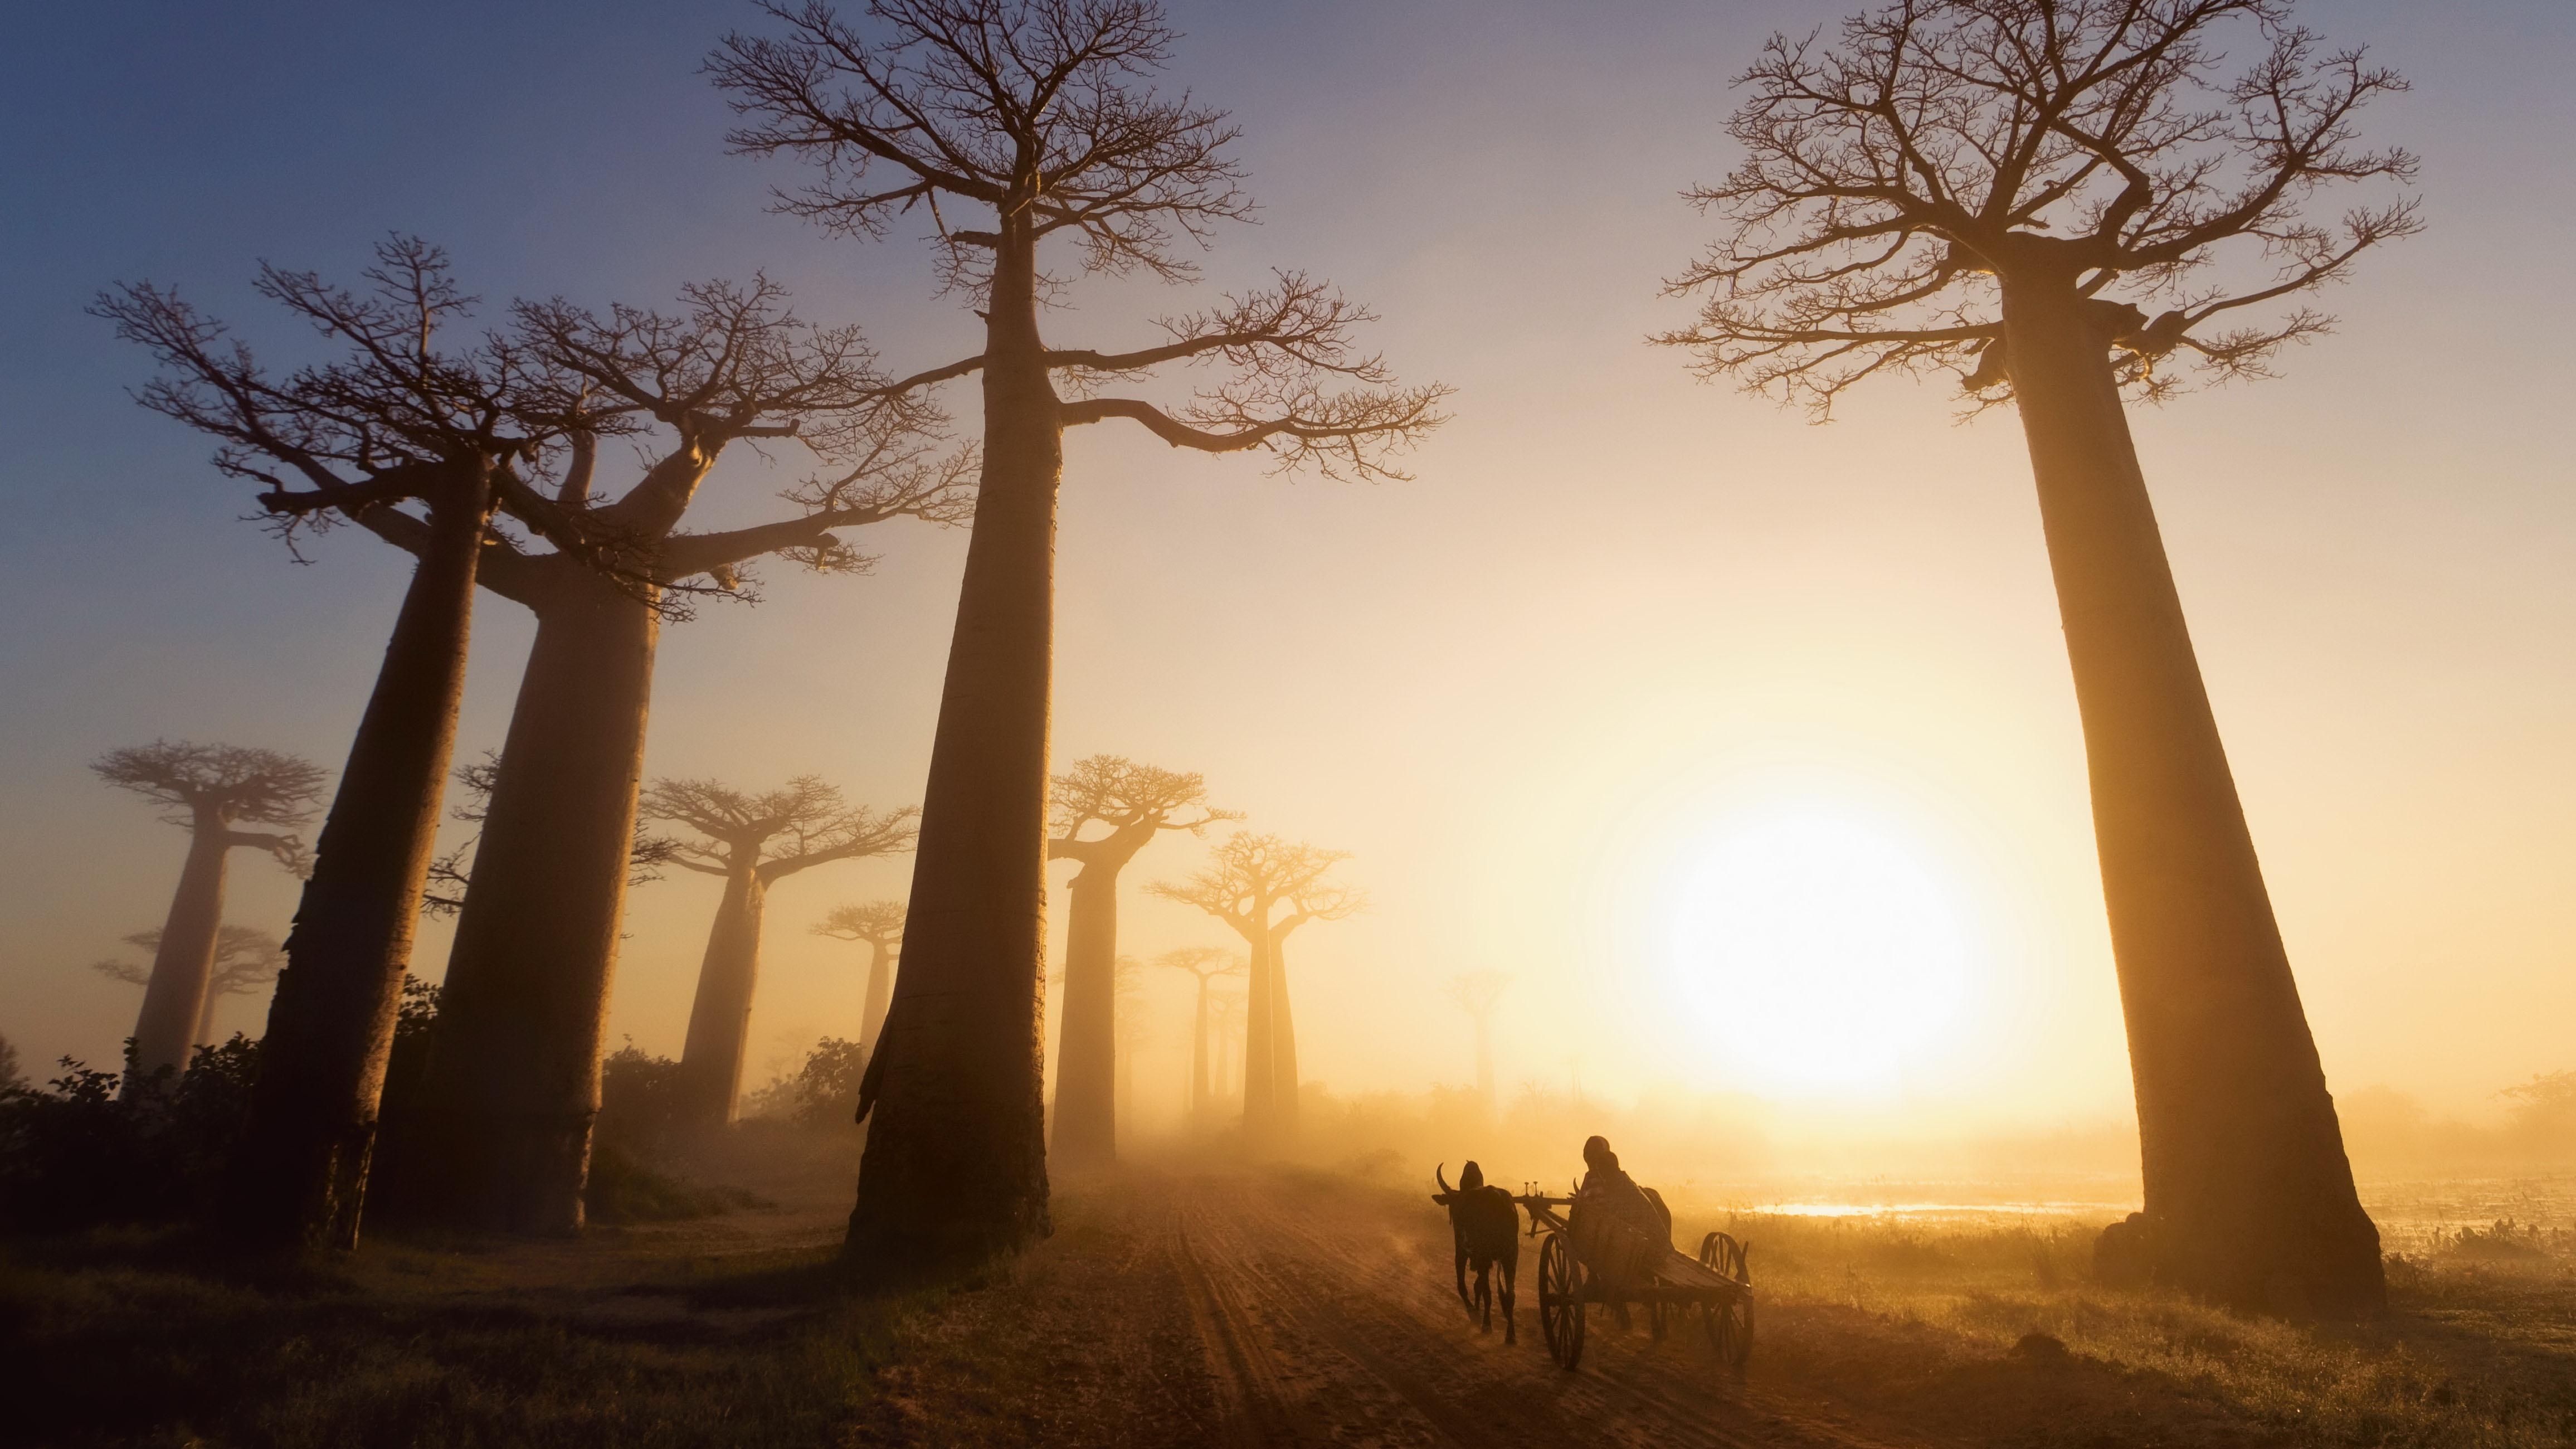 oxcart-baobab-trees-madagascar-by-marsel-van-oosten